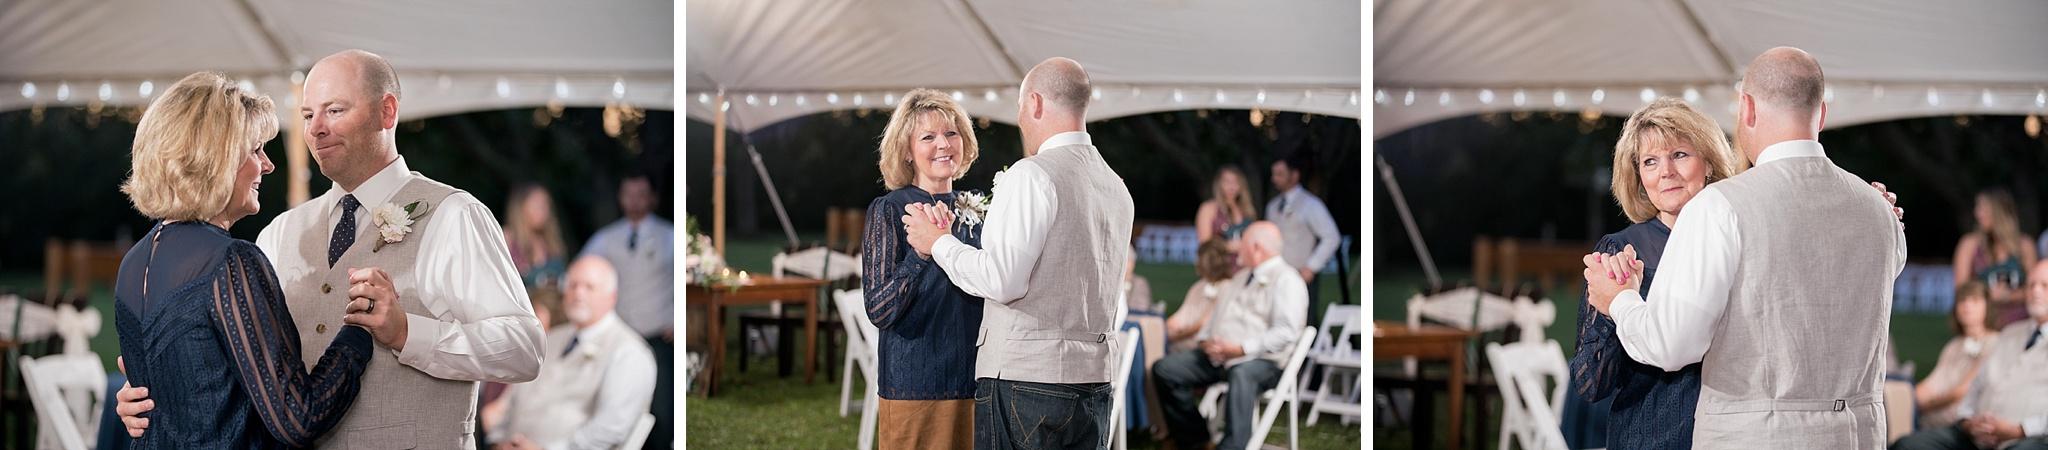 Tarboro-NC-Wedding-Photographer-072.jpg